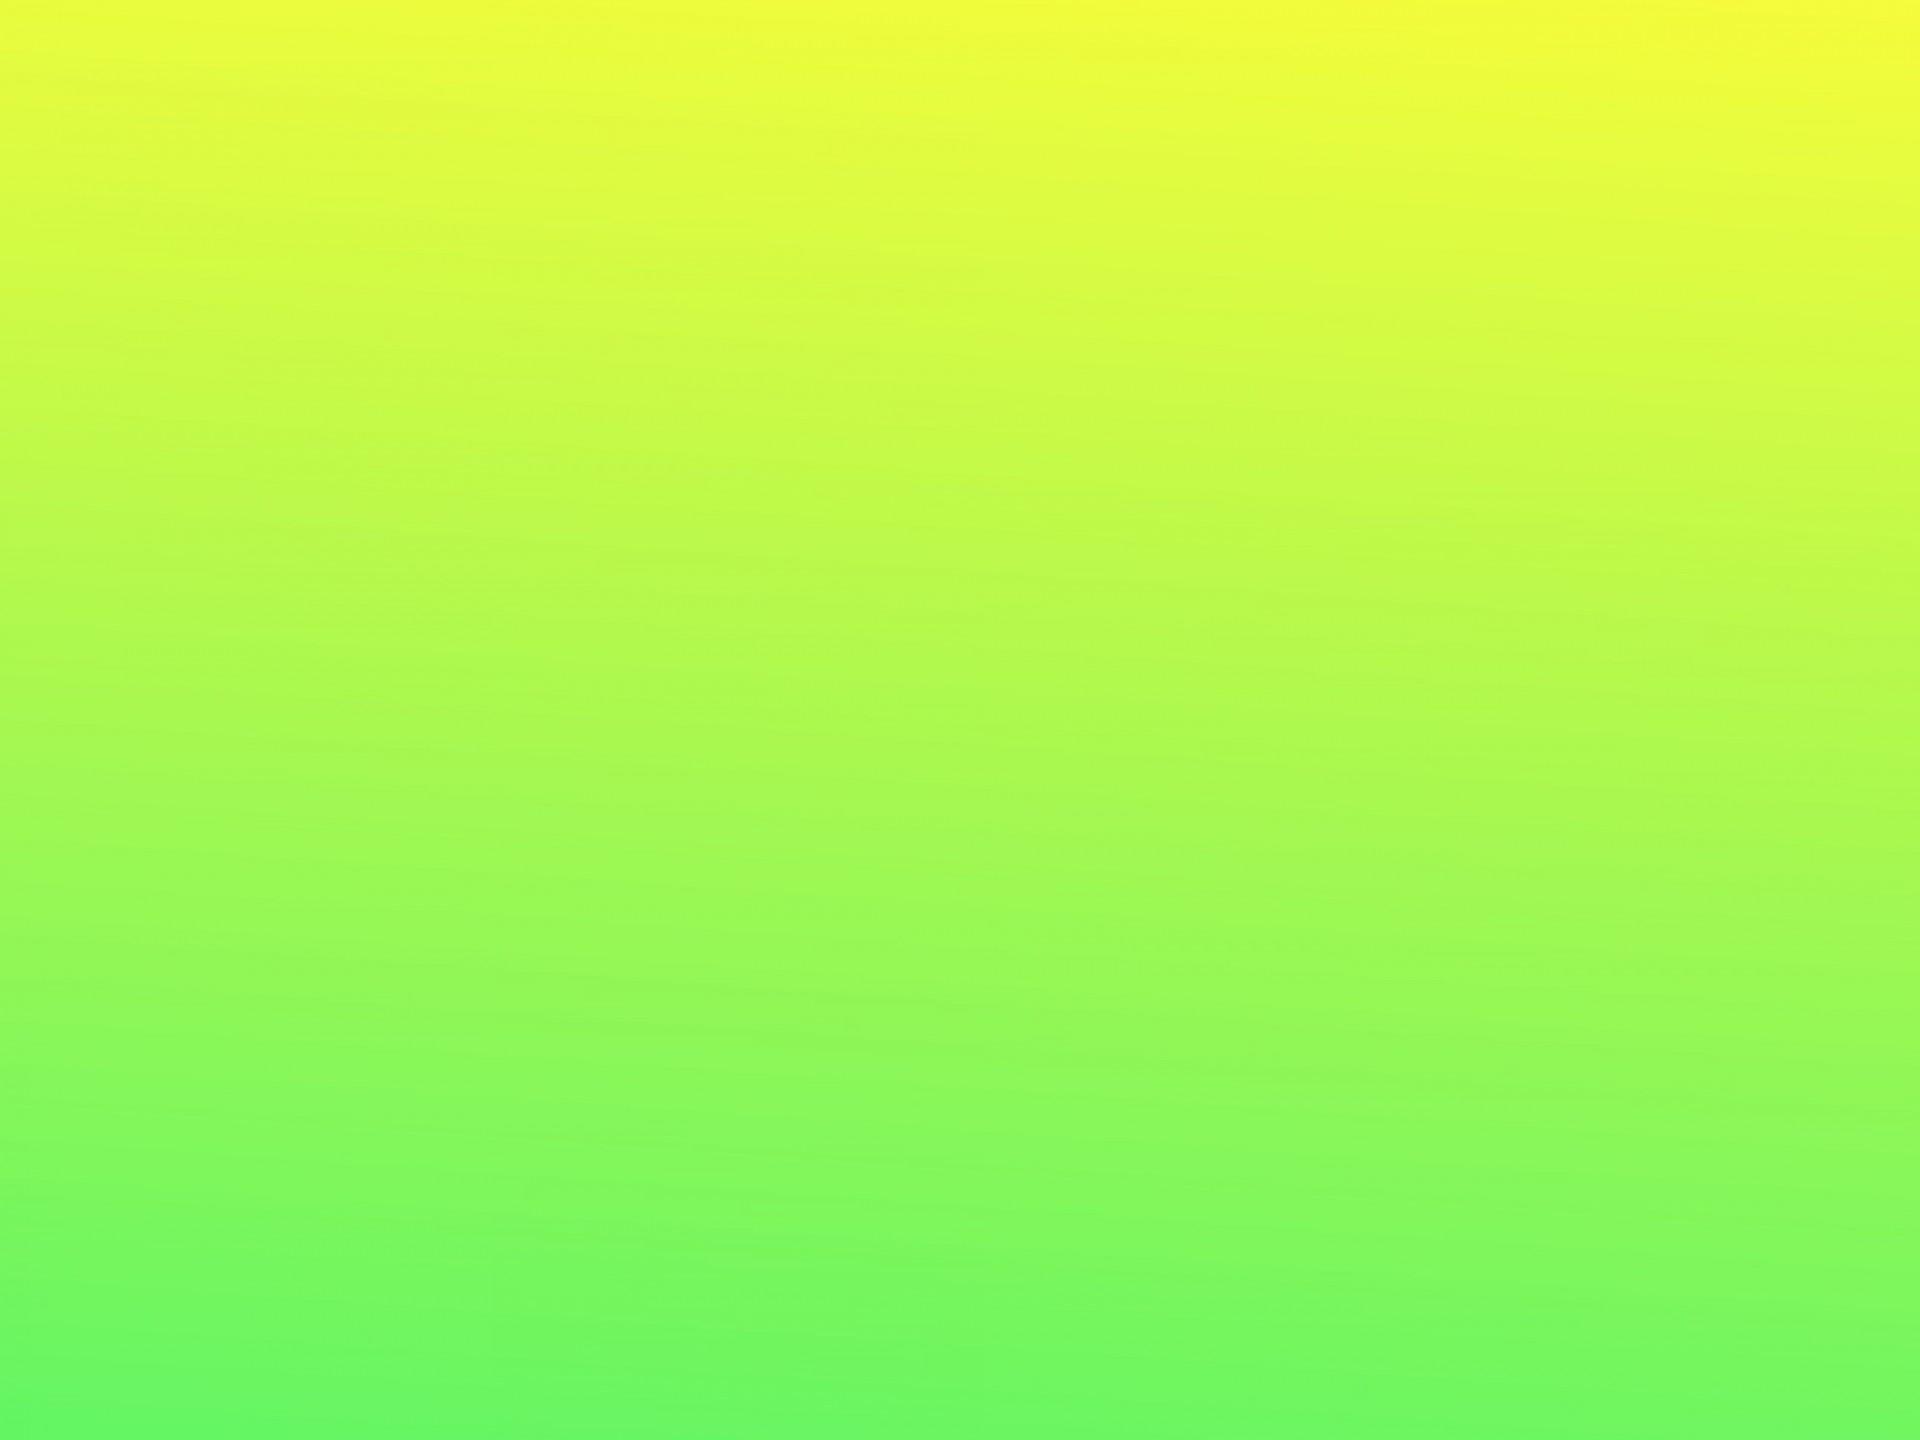 yellow green background デイサービスはいさい 南城市で介護施設を